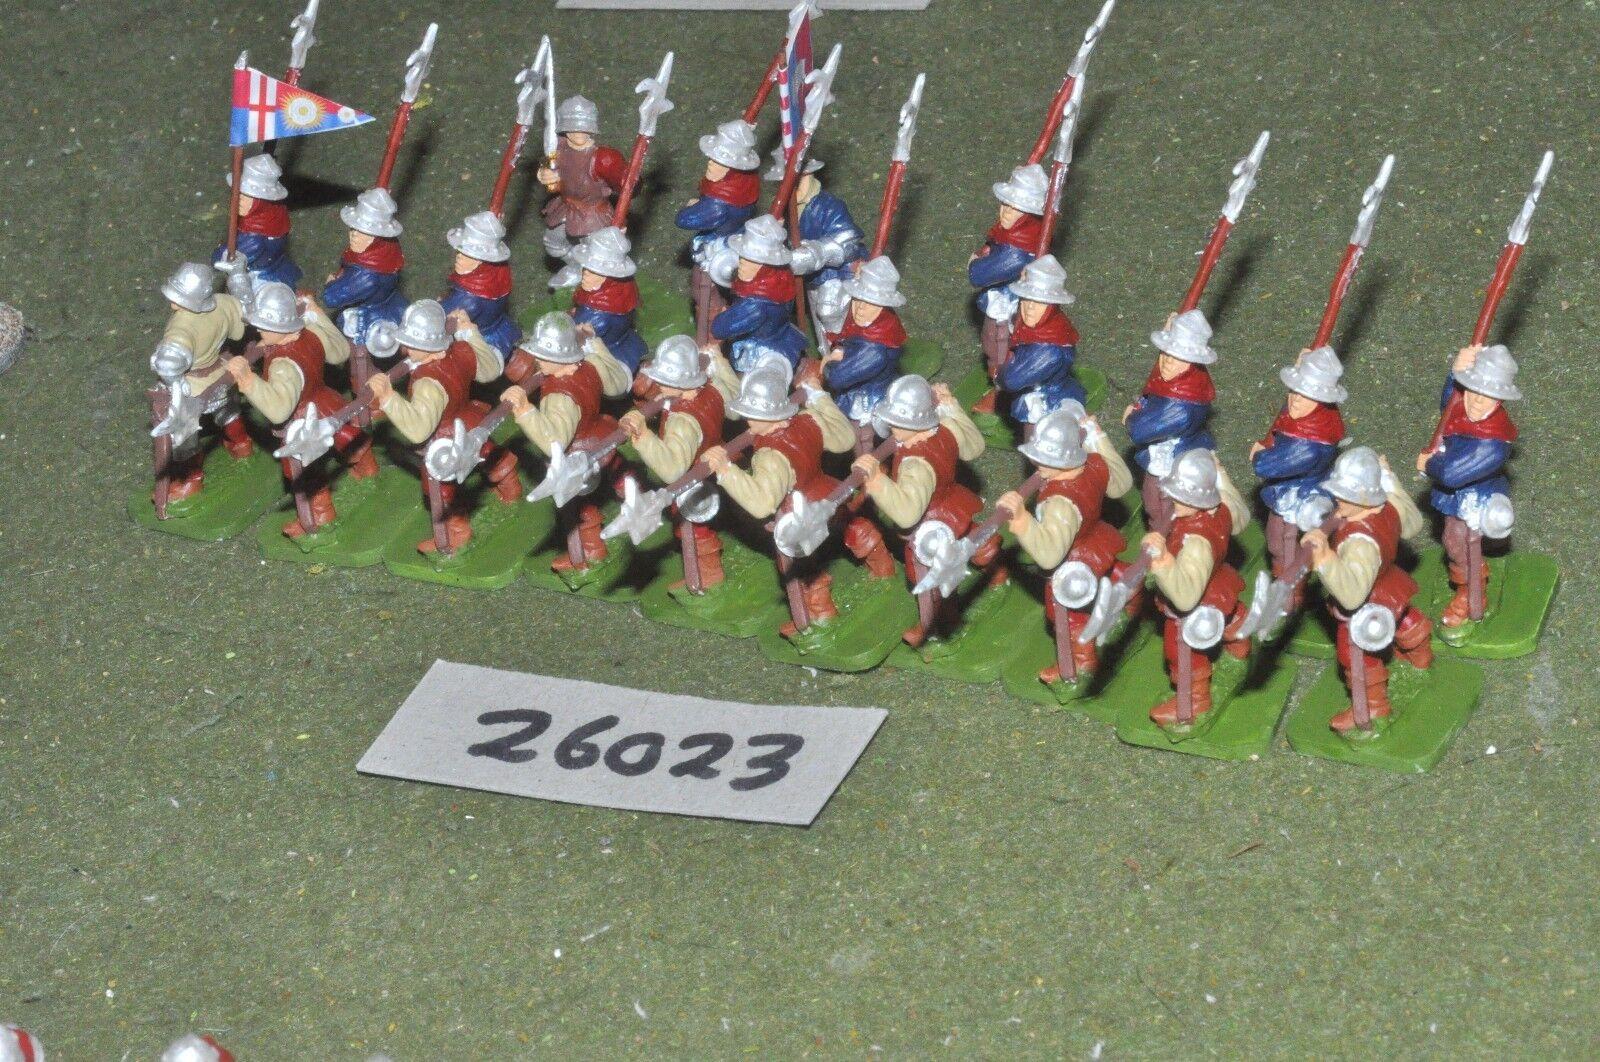 25mm medieval inglés-billmen 24 figuras-INF (26023)